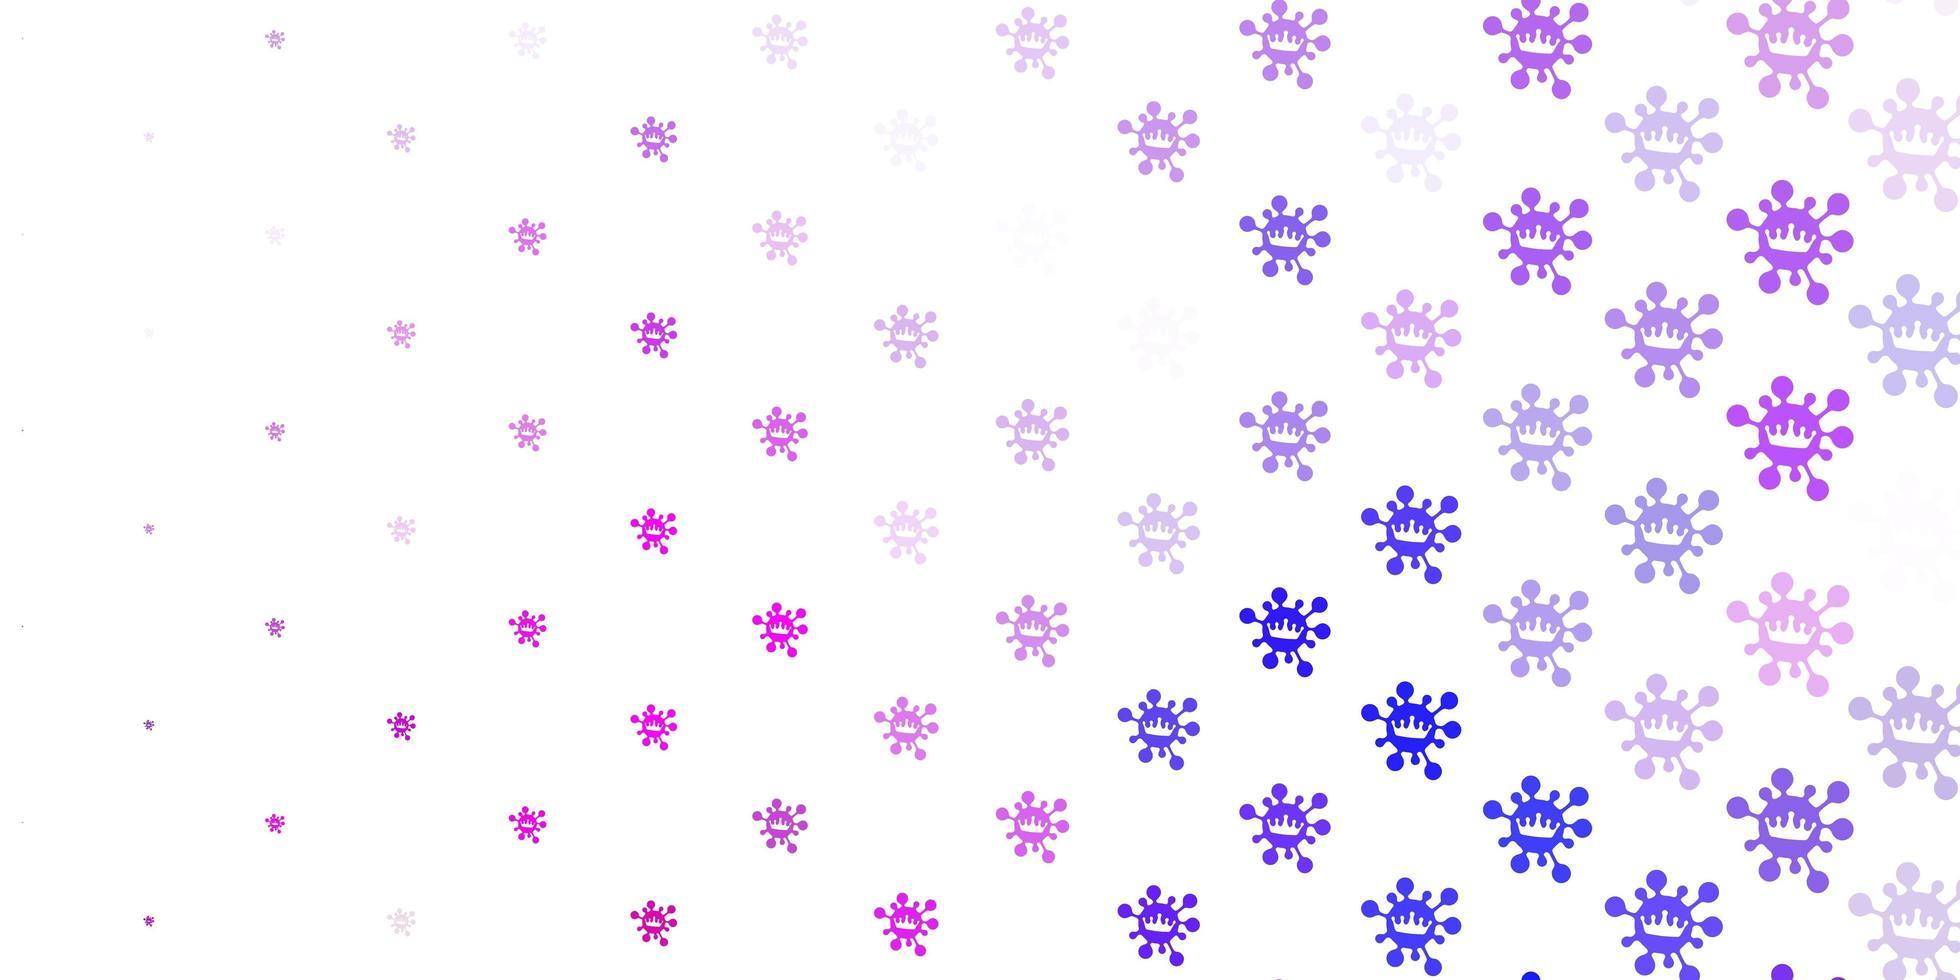 hellvioletter, rosa Hintergrund mit Covid-19-Symbolen. vektor